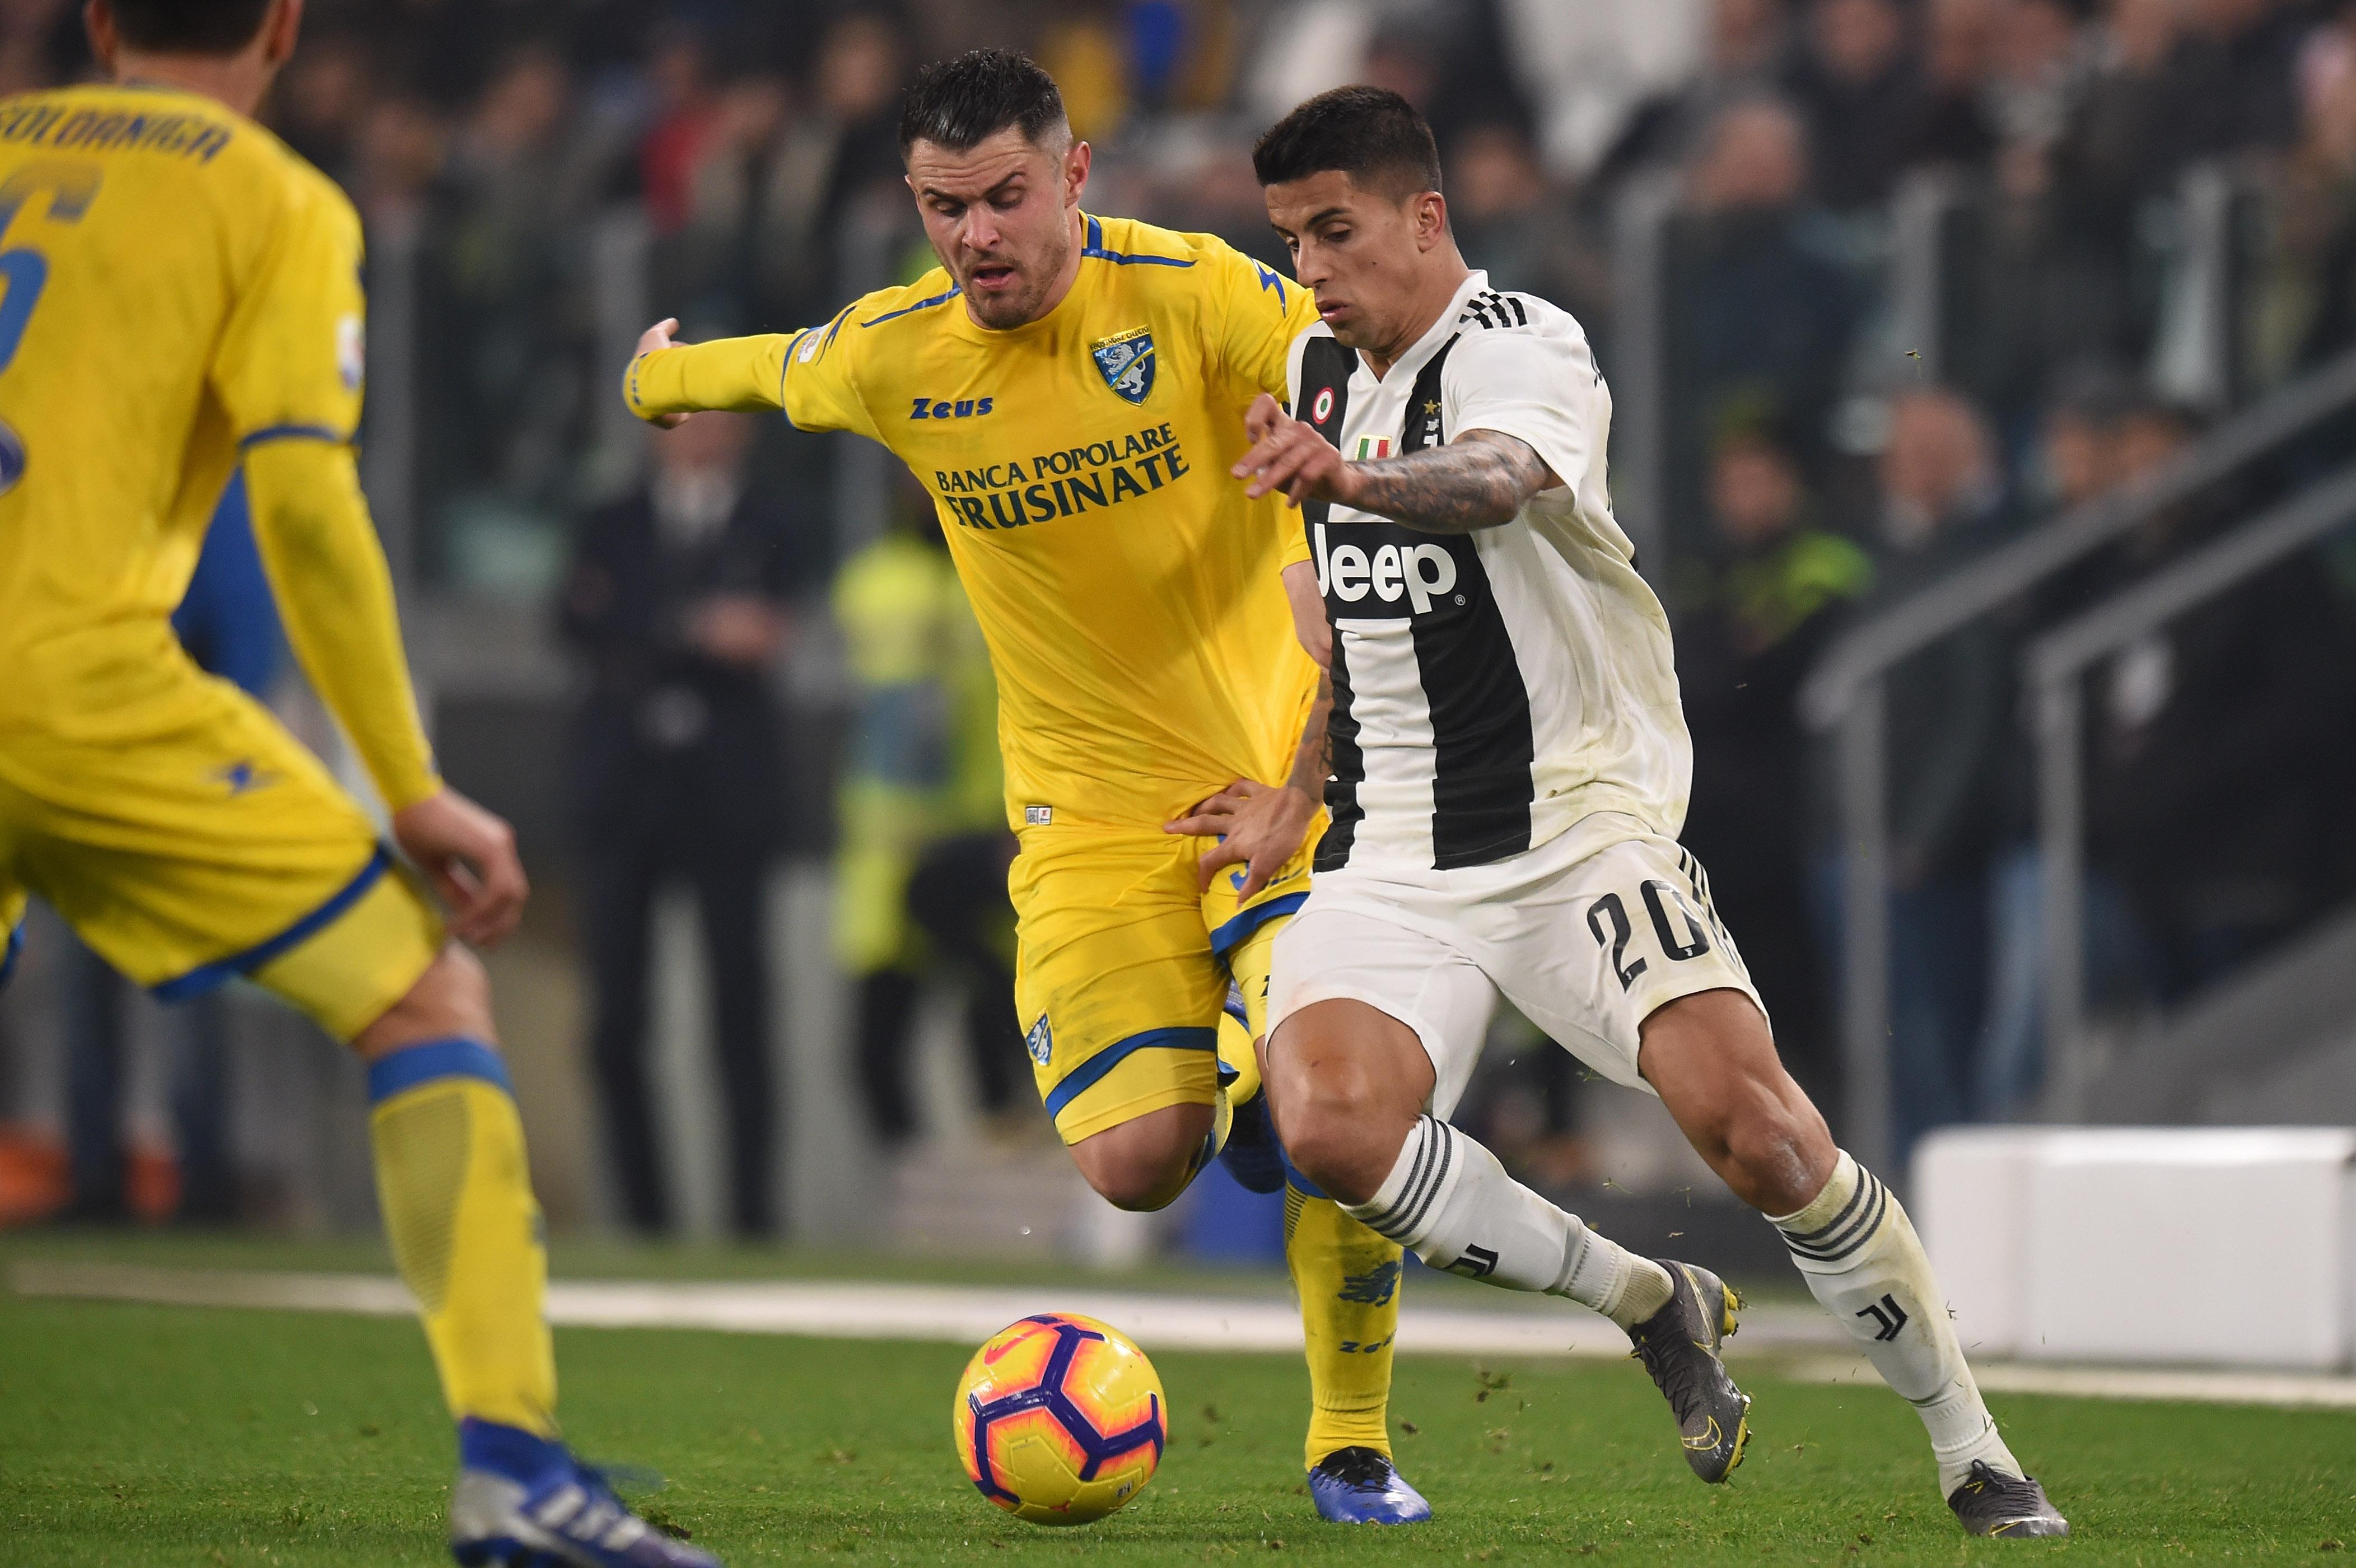 Juventus v Frosinone Calcio - Serie A